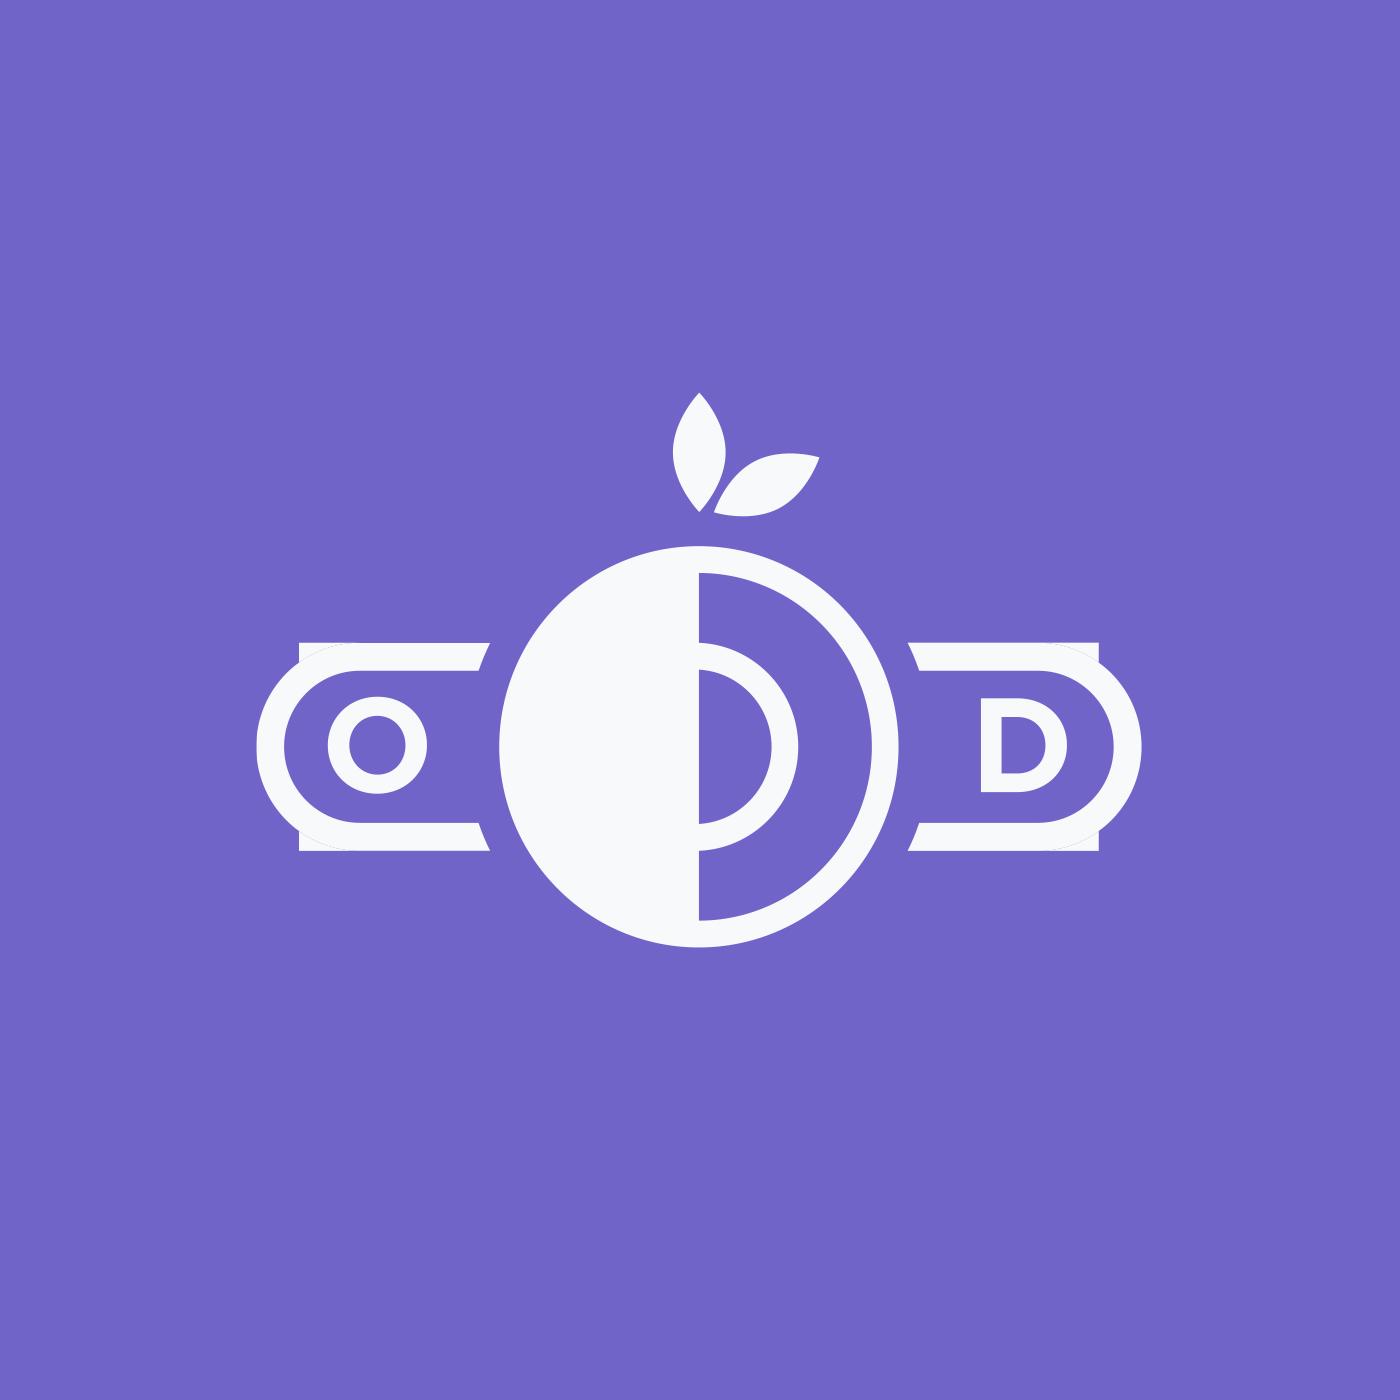 Orlando Designers Slack Community